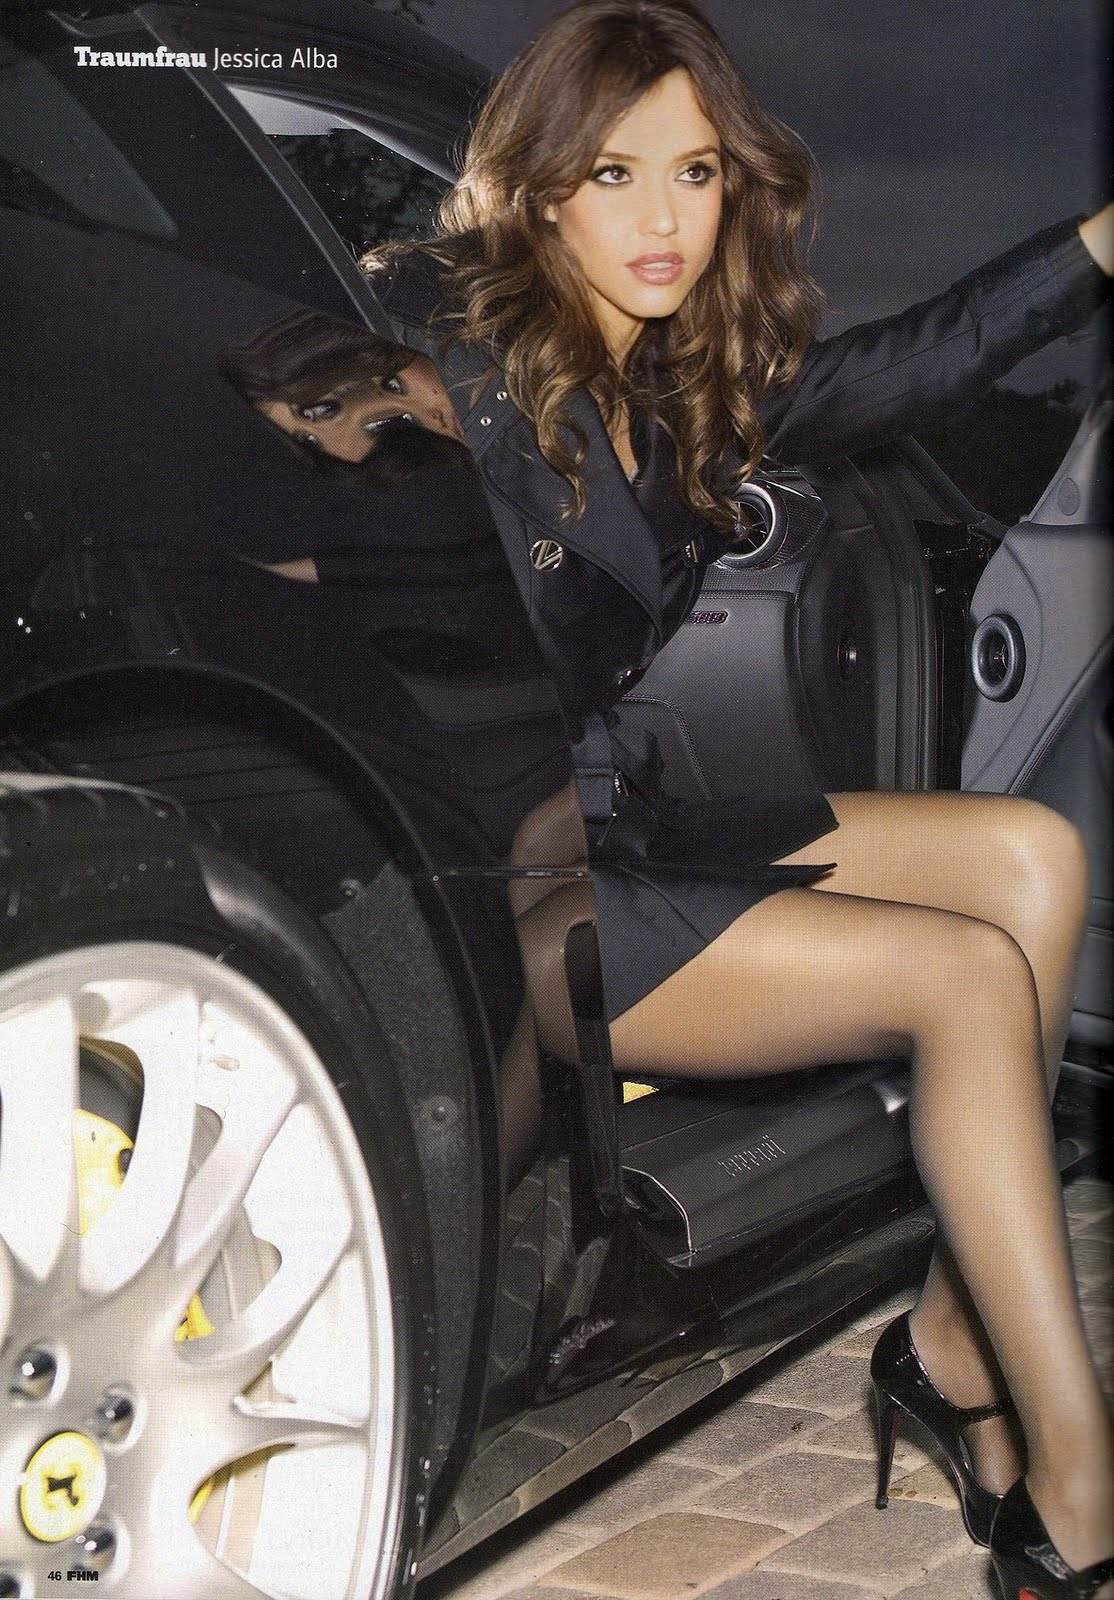 http://4.bp.blogspot.com/_D4ALWhm-tC4/TN3PaVD3bPI/AAAAAAAAE1o/wHgpHnIDOww/s1600/Jessica_Alba_FHM_Diciembre2010%2B%25281%2529.jpg